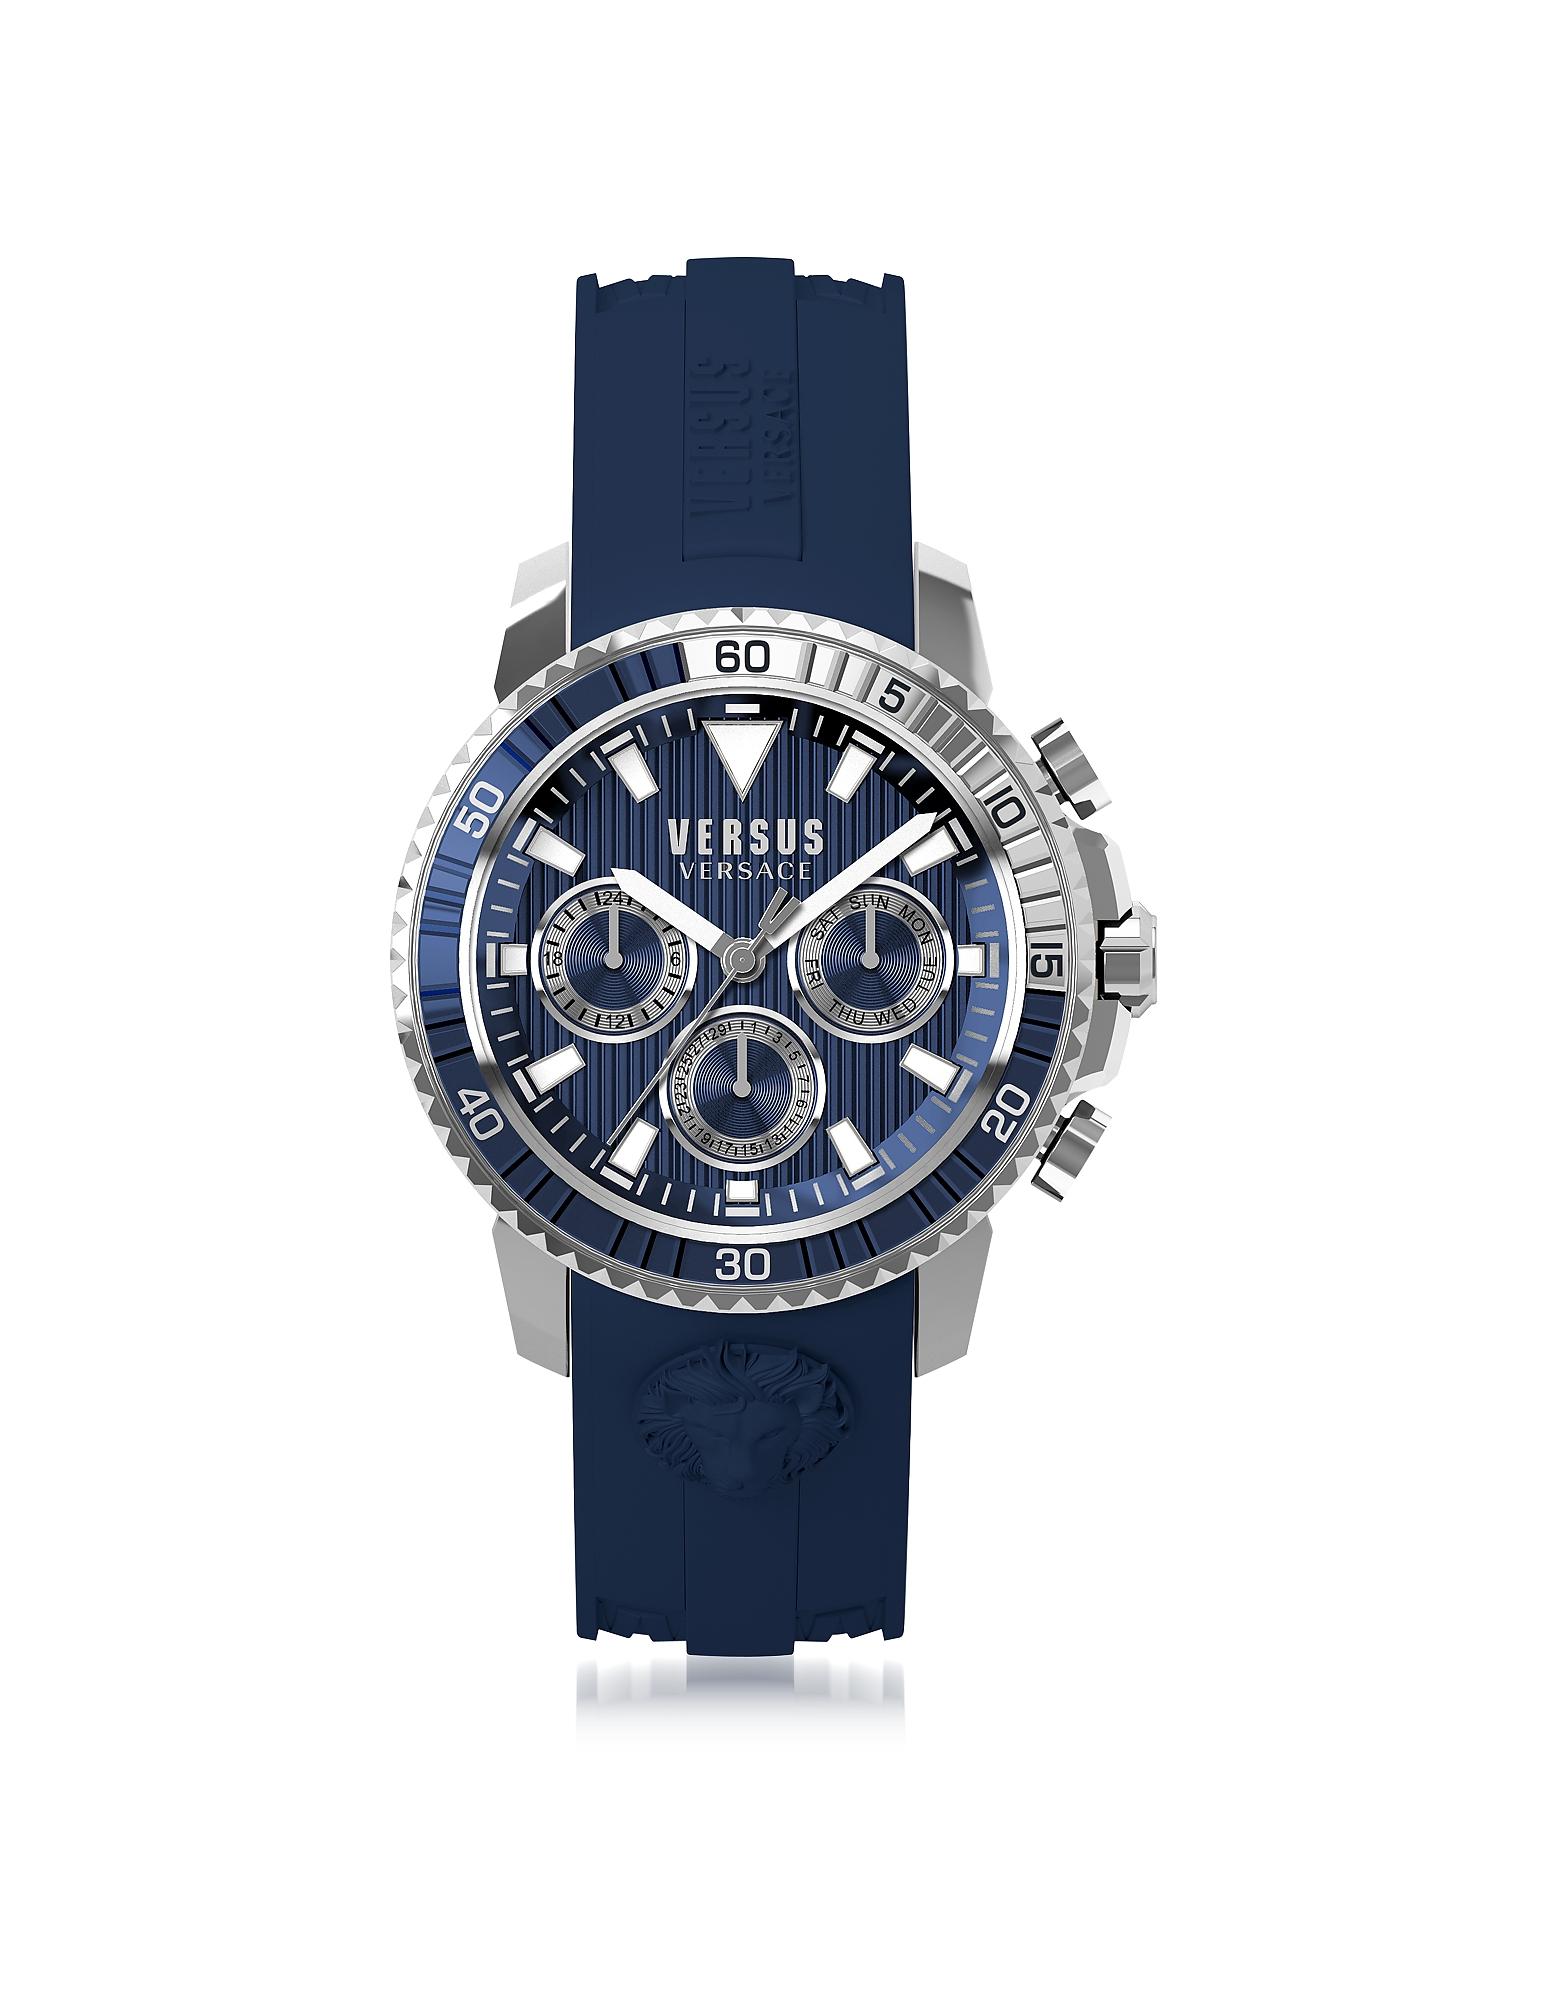 Versace Versus Men's Watches, Aberdeen Silver Stainless Steel Men's Chronograph Watch w/Blue Silicon